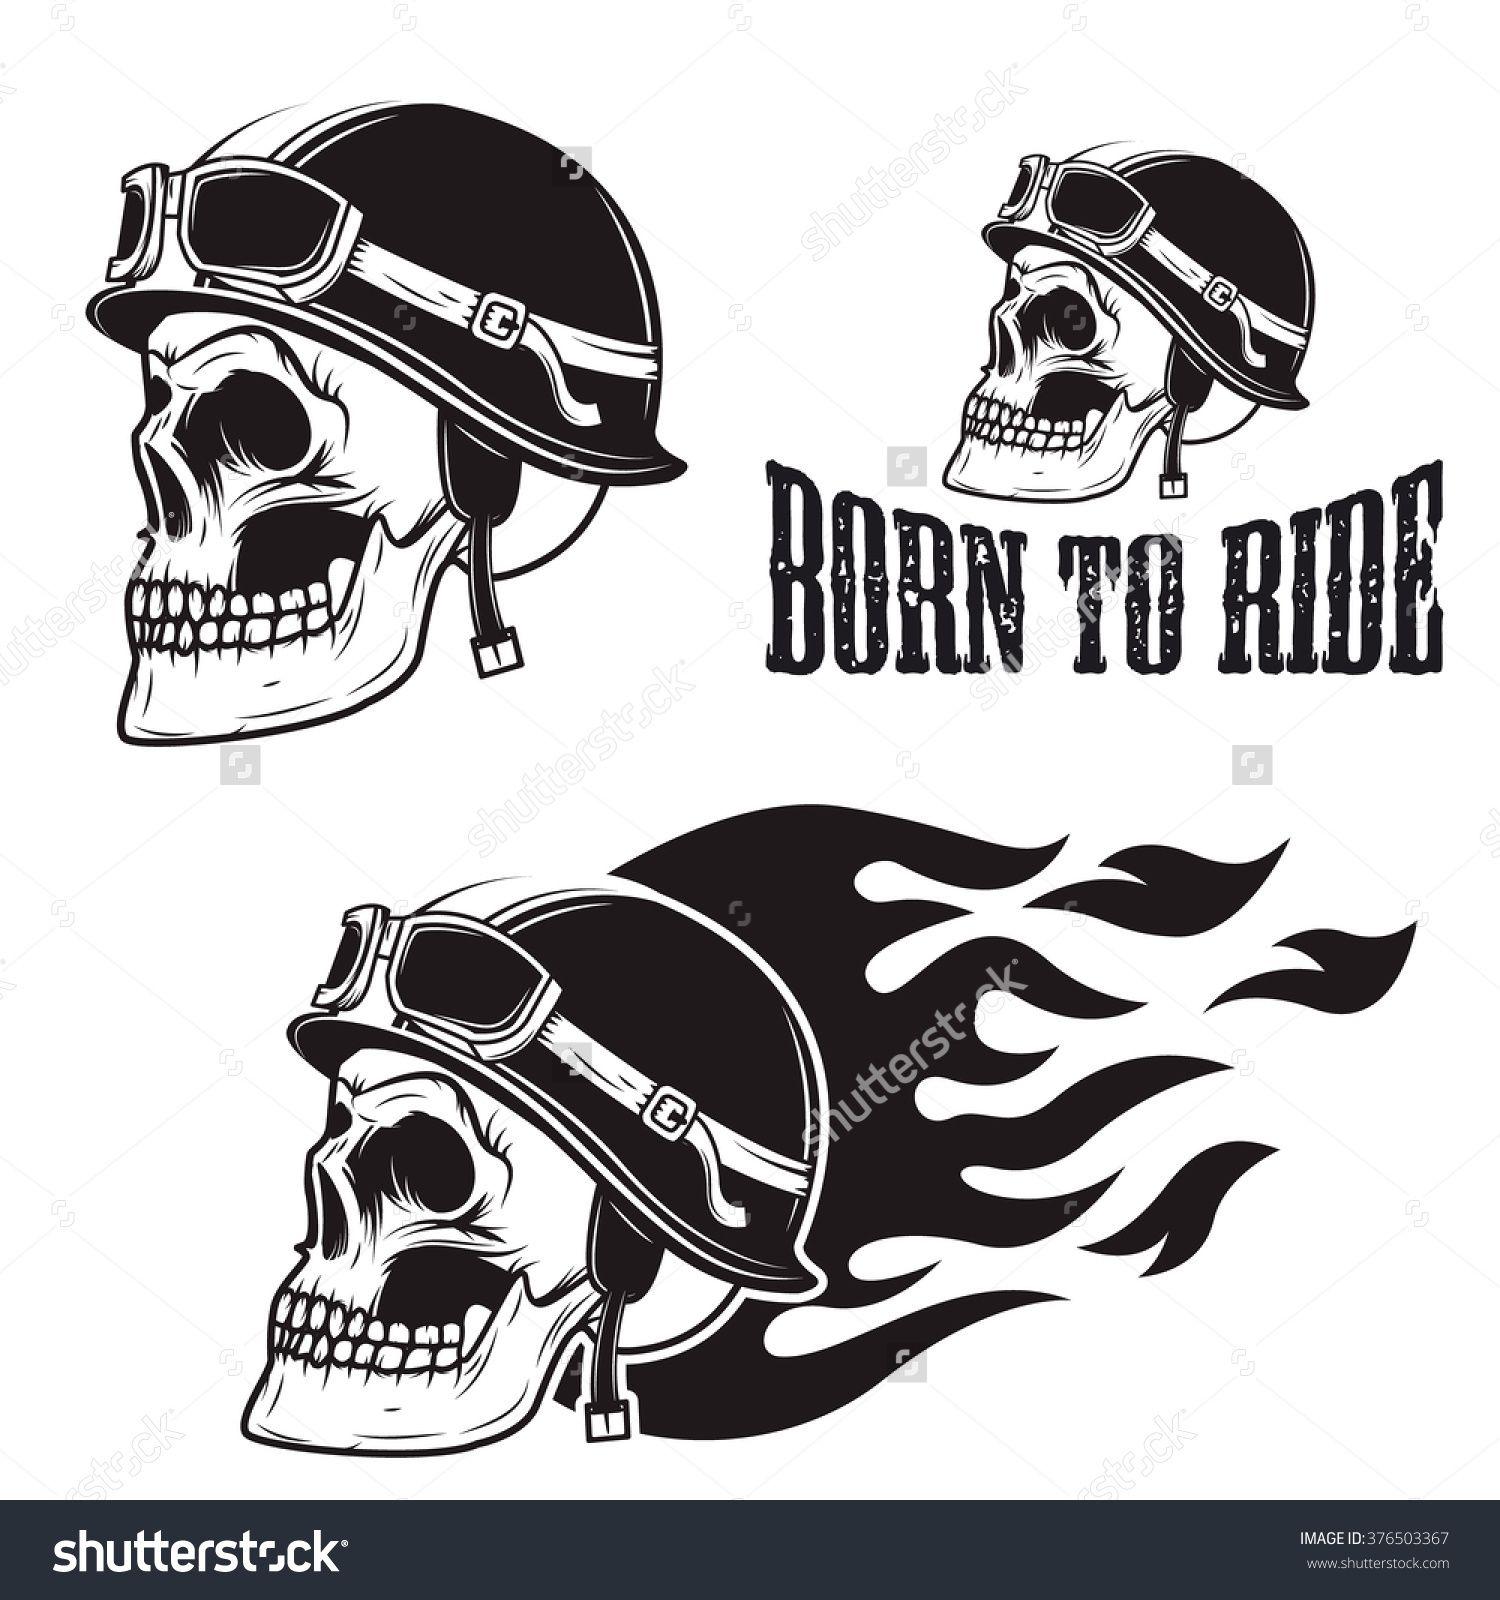 Skull In Motorcycle Helmet With Fire Born To Ride Retro Vector Design Graphic Element Emblem Logo Insignia Biker Tattoos Biker Art Print Design Template